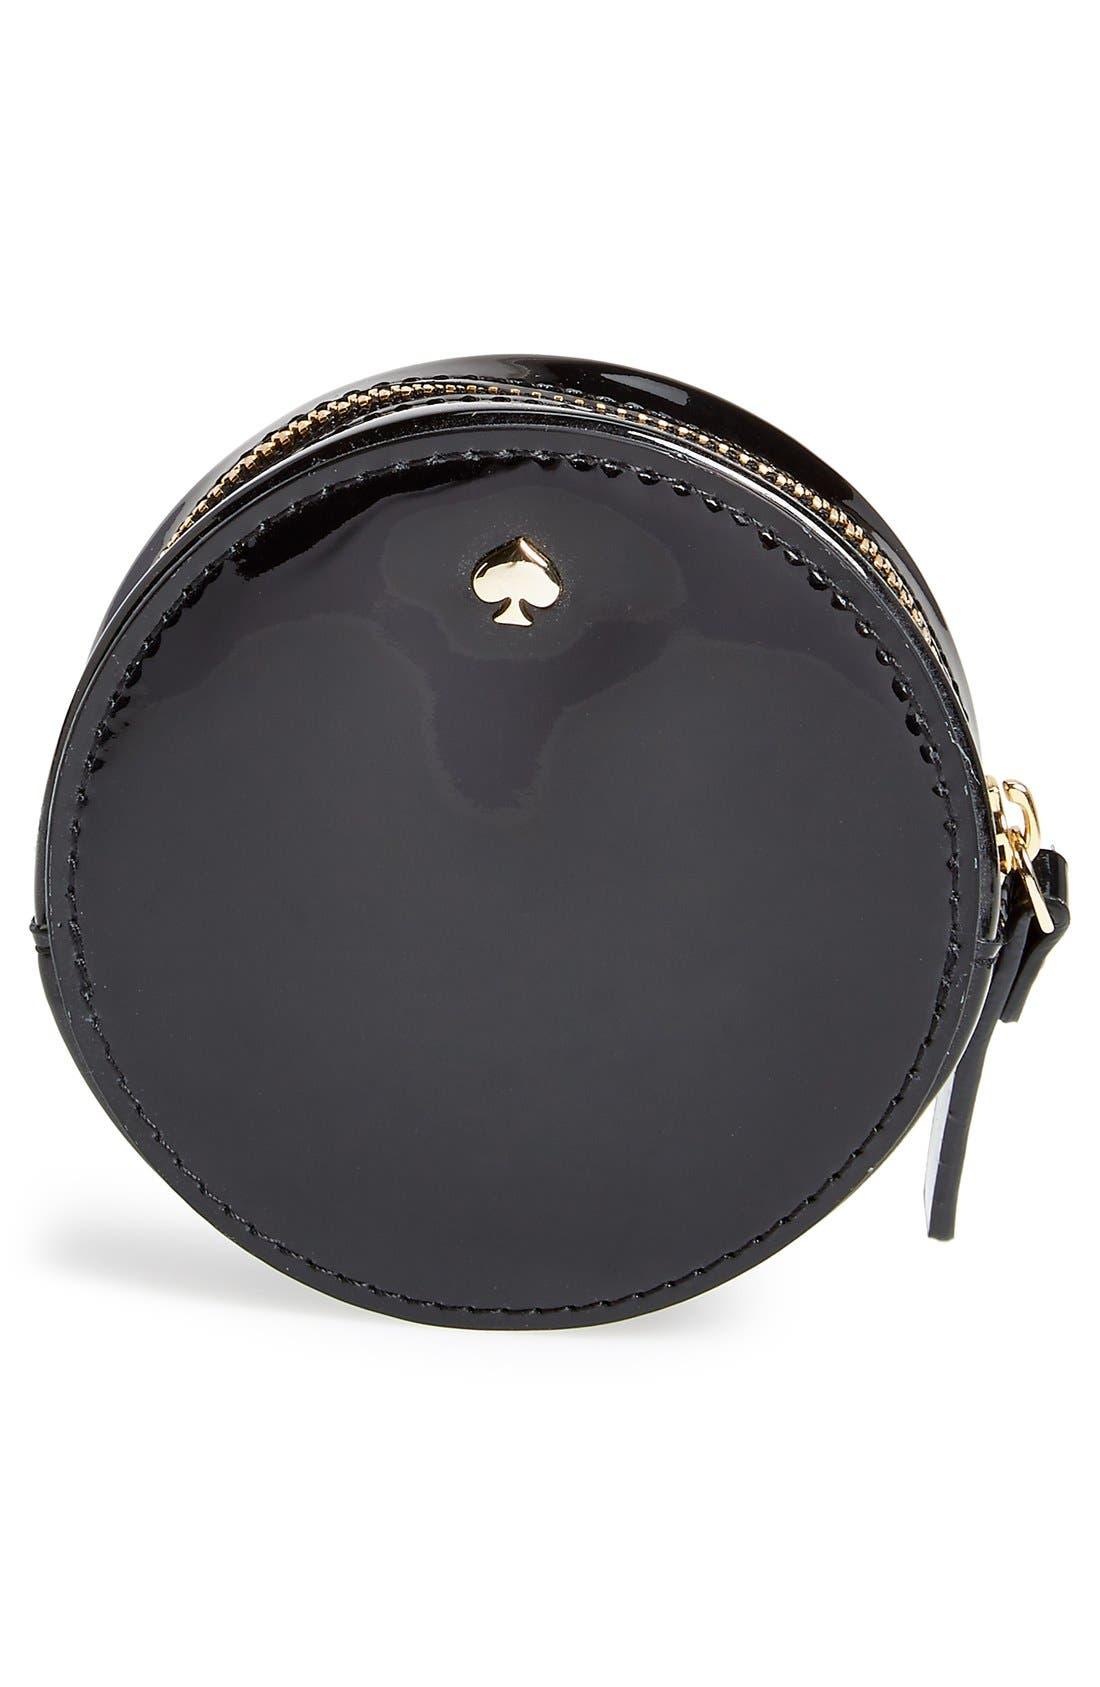 'all aboard - clock' coin purse,                             Alternate thumbnail 2, color,                             001